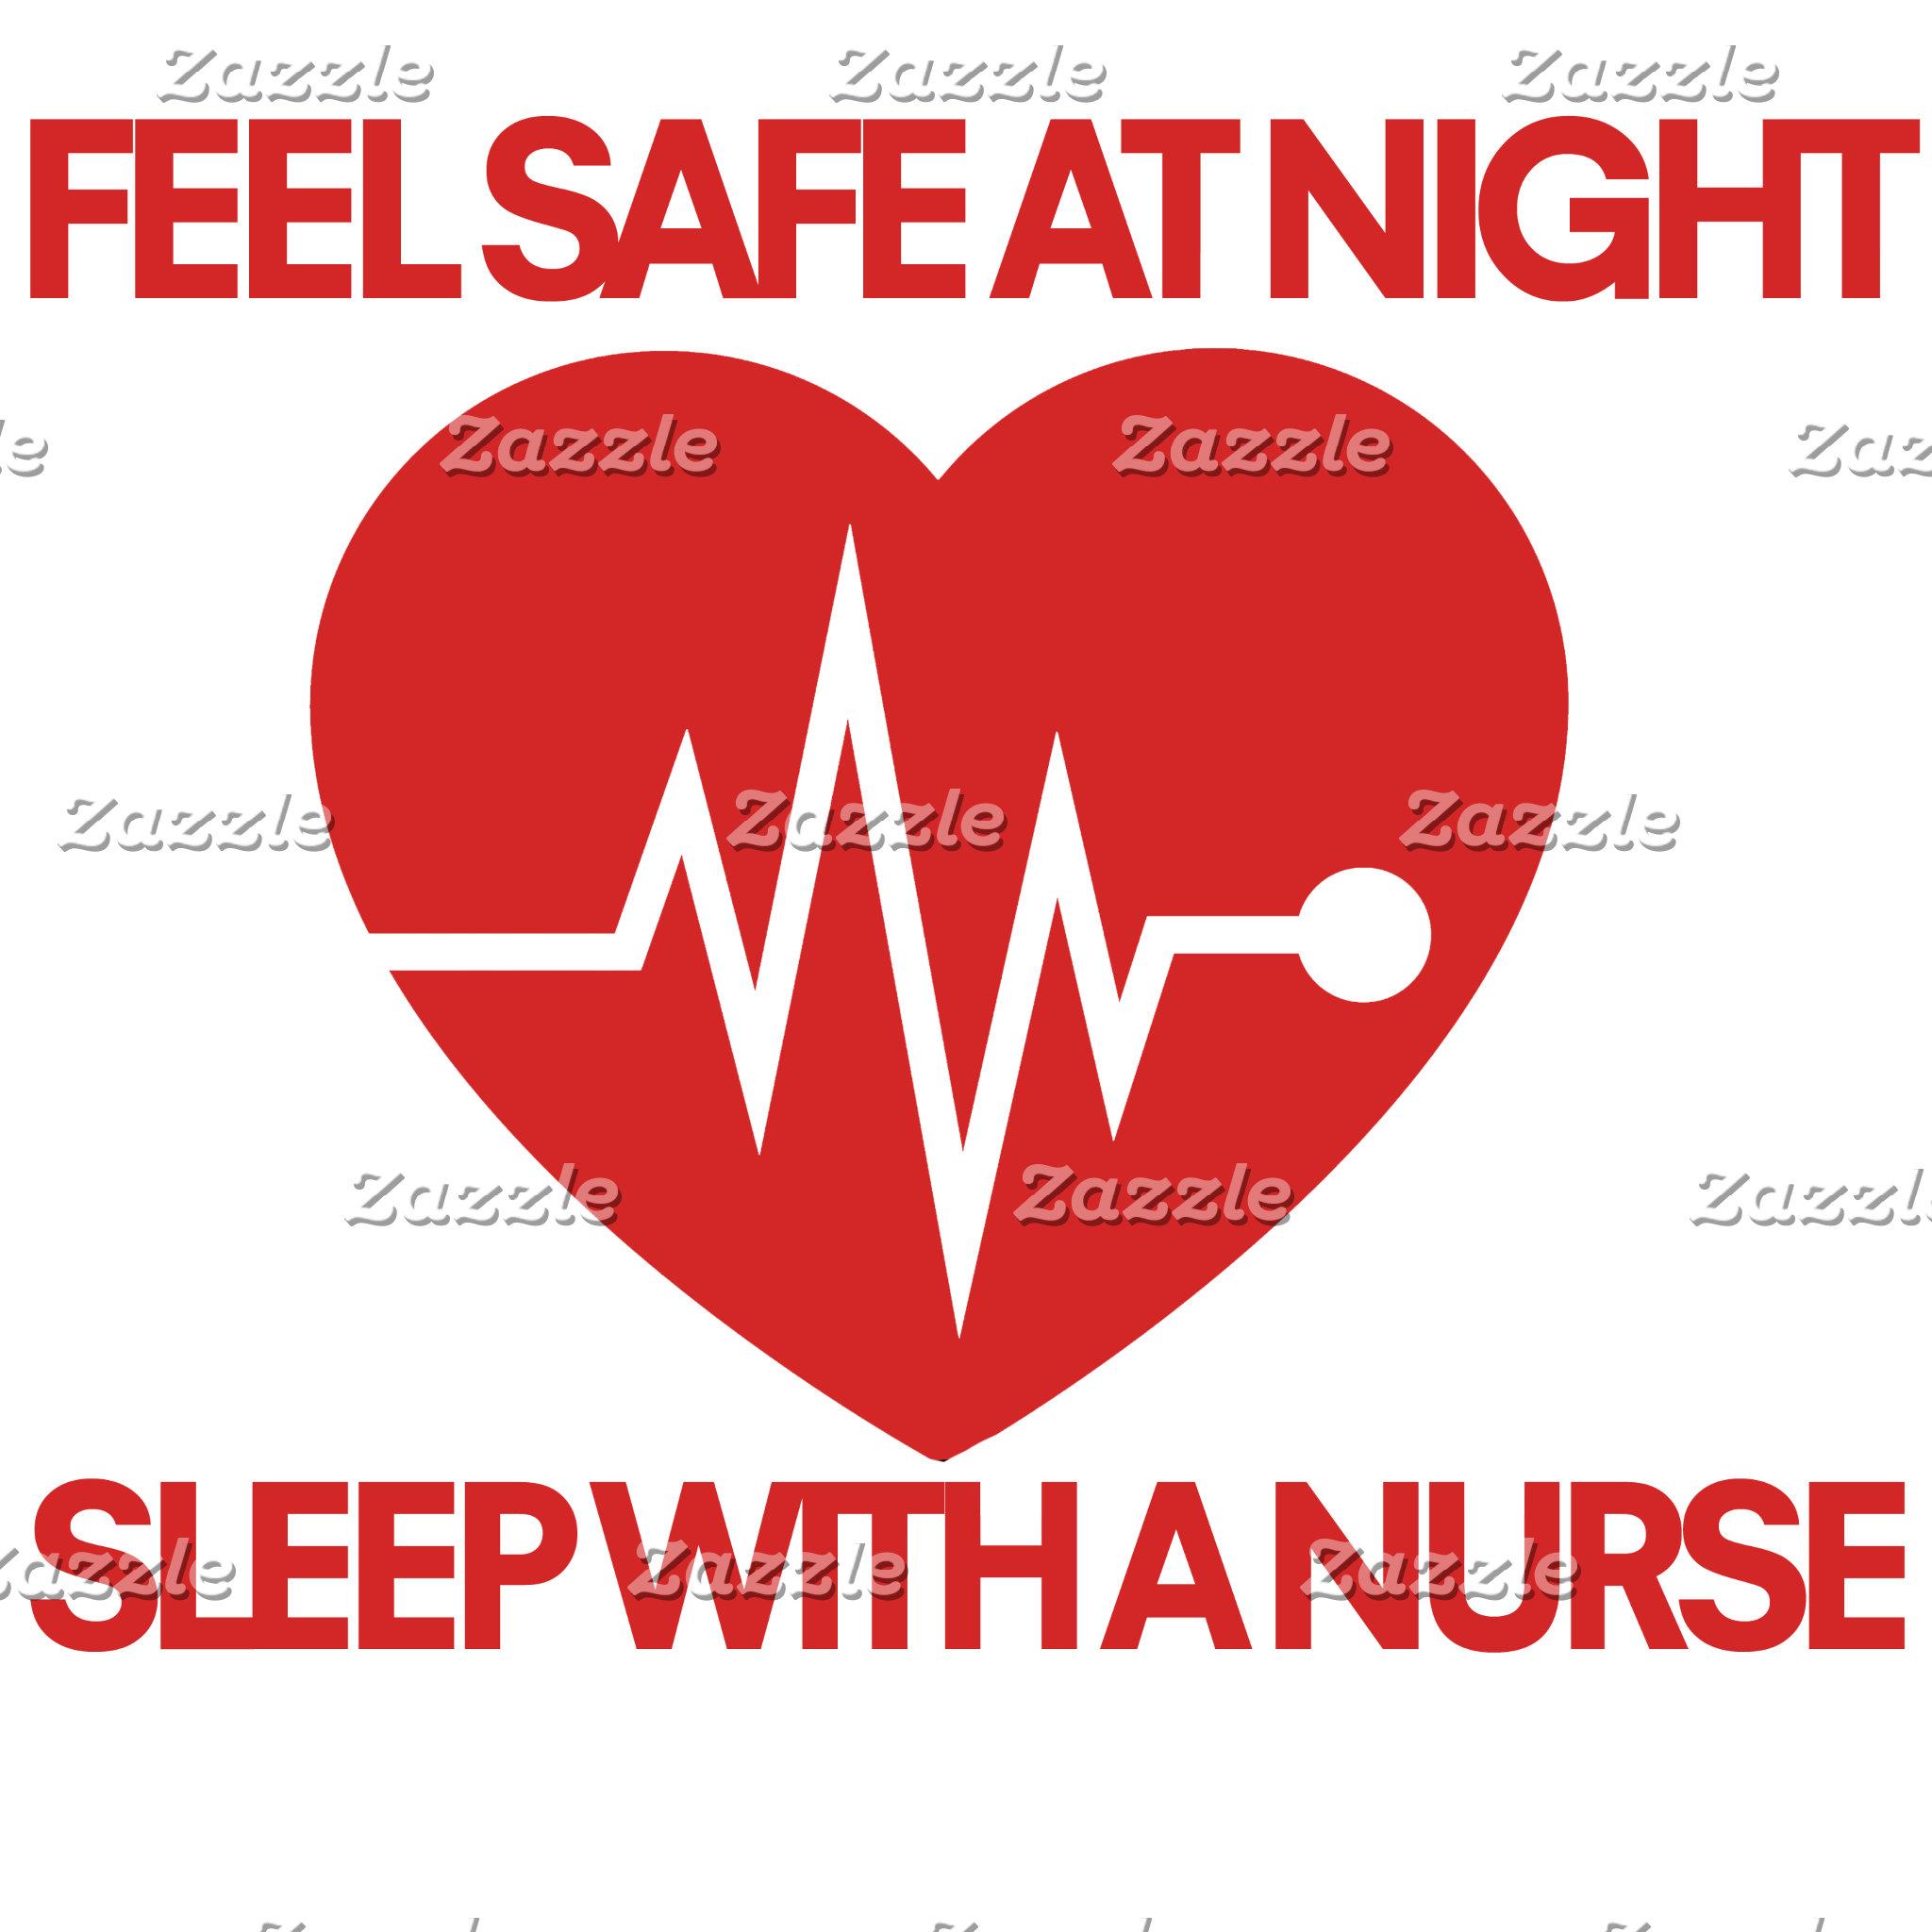 Be safe at night sleep with a nurse